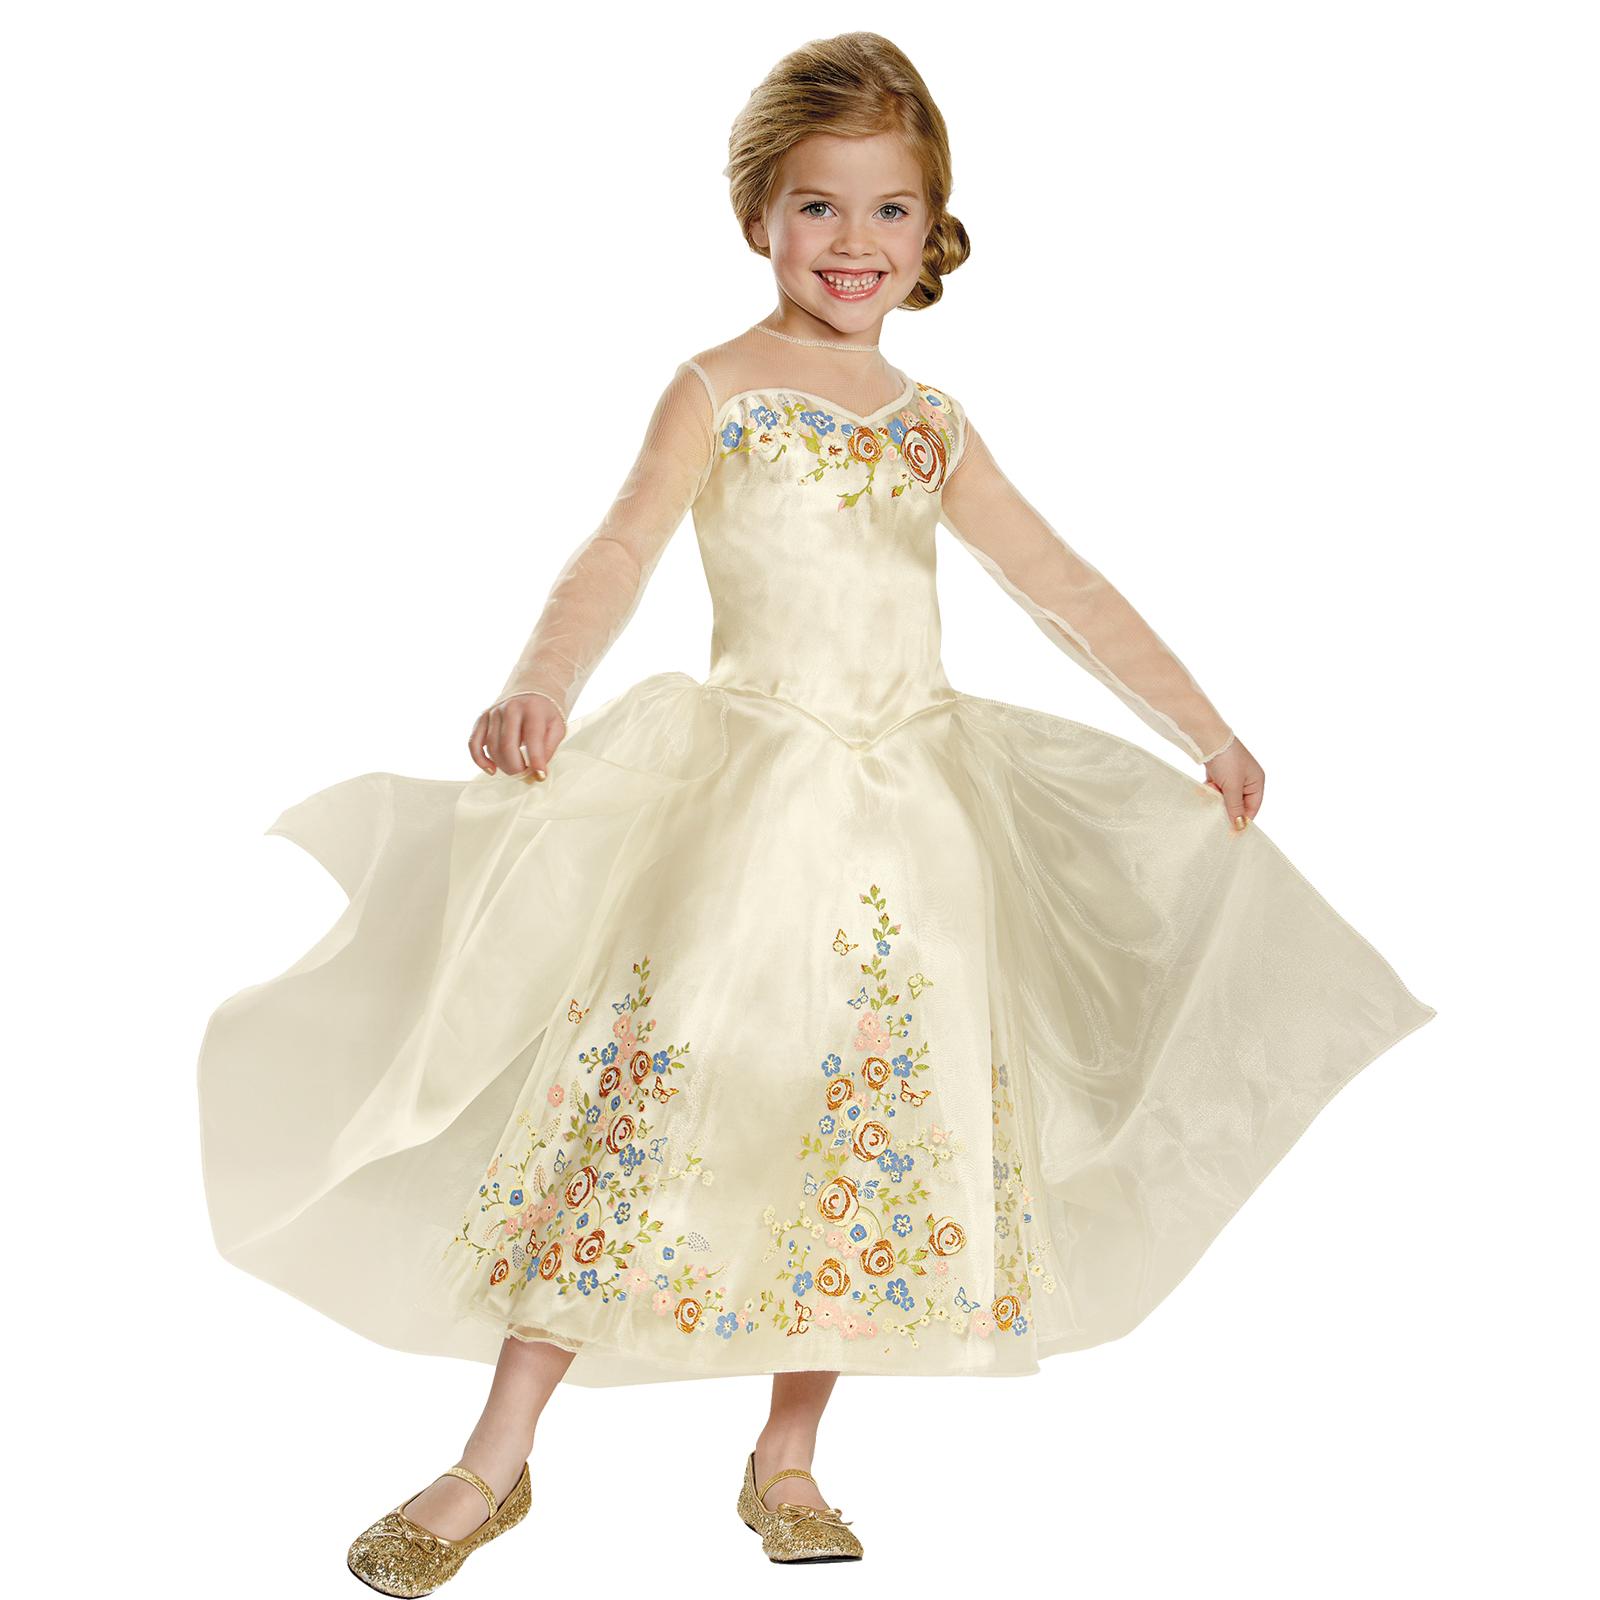 tinkerbell wedding dress disney kids wedding dresses Girl S Cinderella Wedding Dress Costume The Top Costumes For Girls